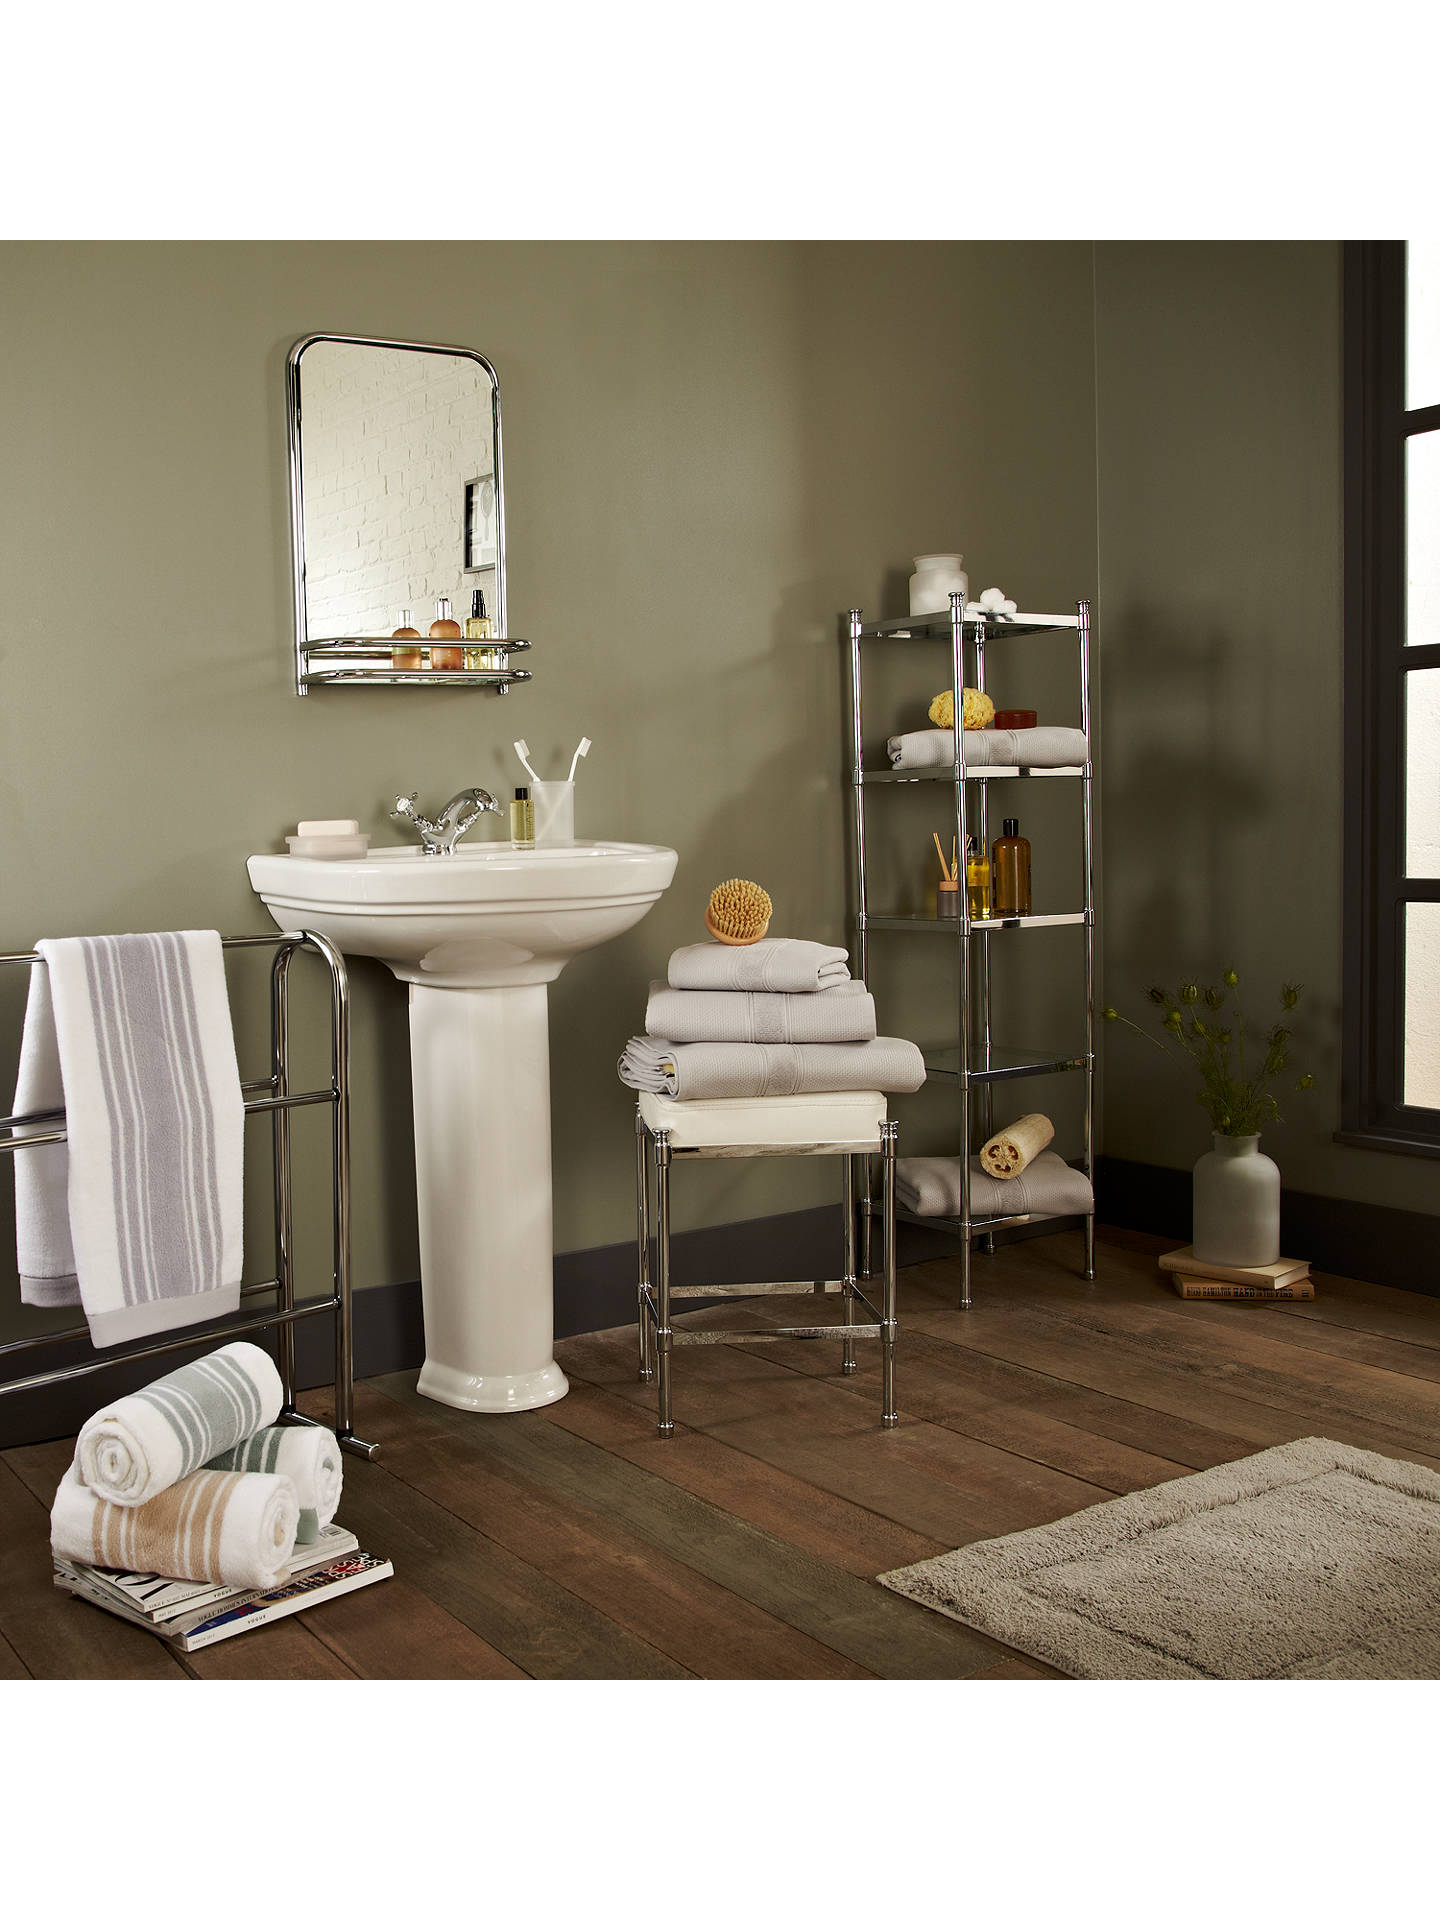 Enjoyable John Lewis Restoration Bathroom Wall Mirror With Shelf At Interior Design Ideas Ghosoteloinfo